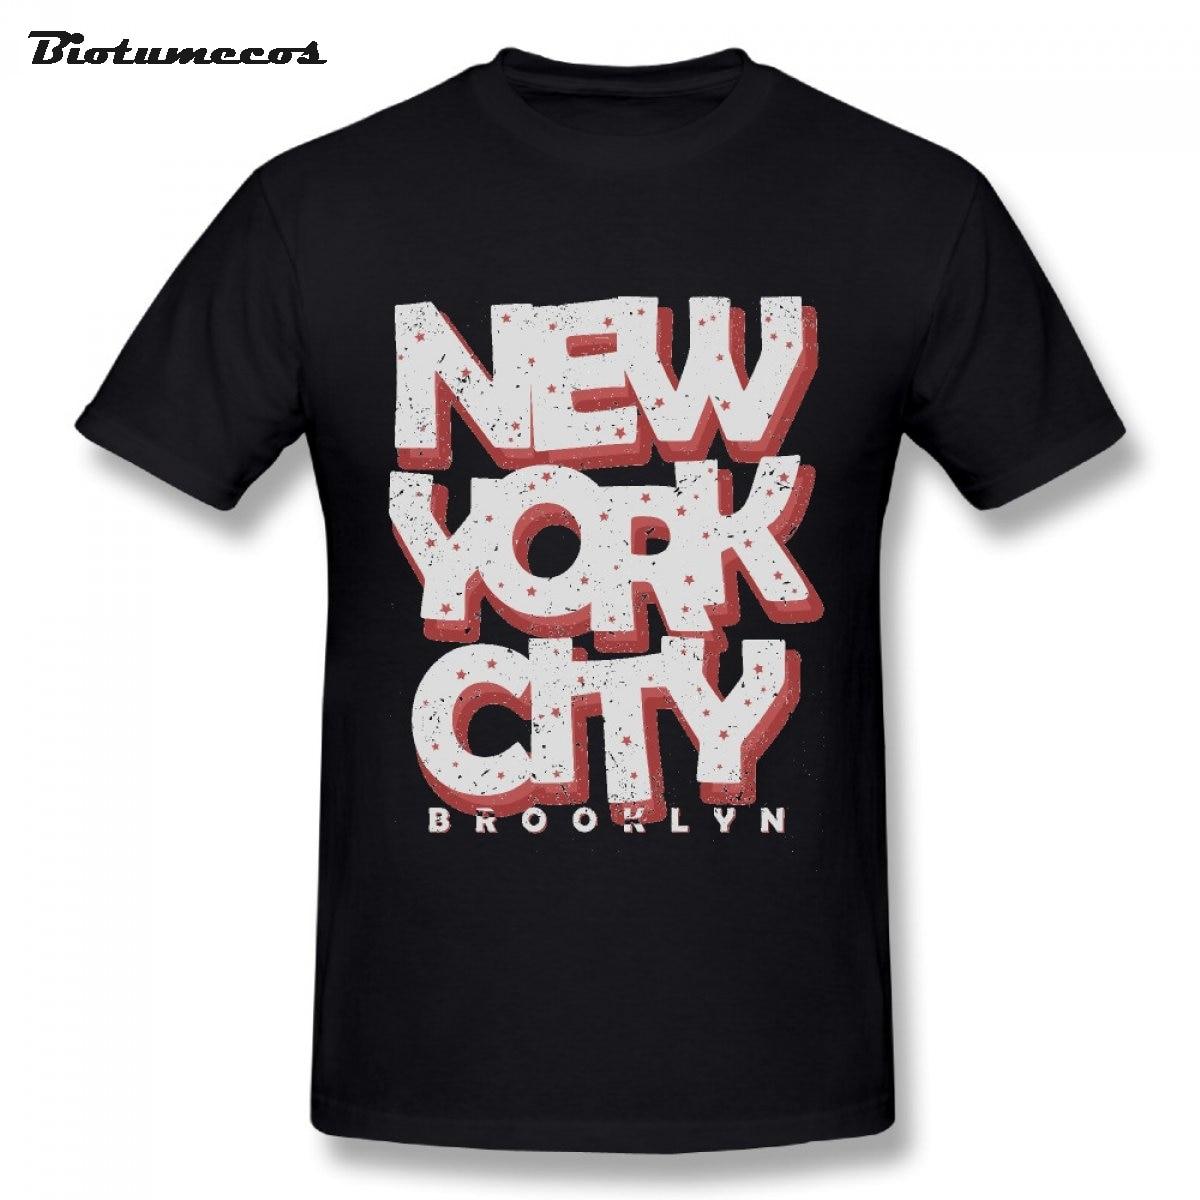 Online Get Cheap T Shirt Printing York -Aliexpress.com | Alibaba Group